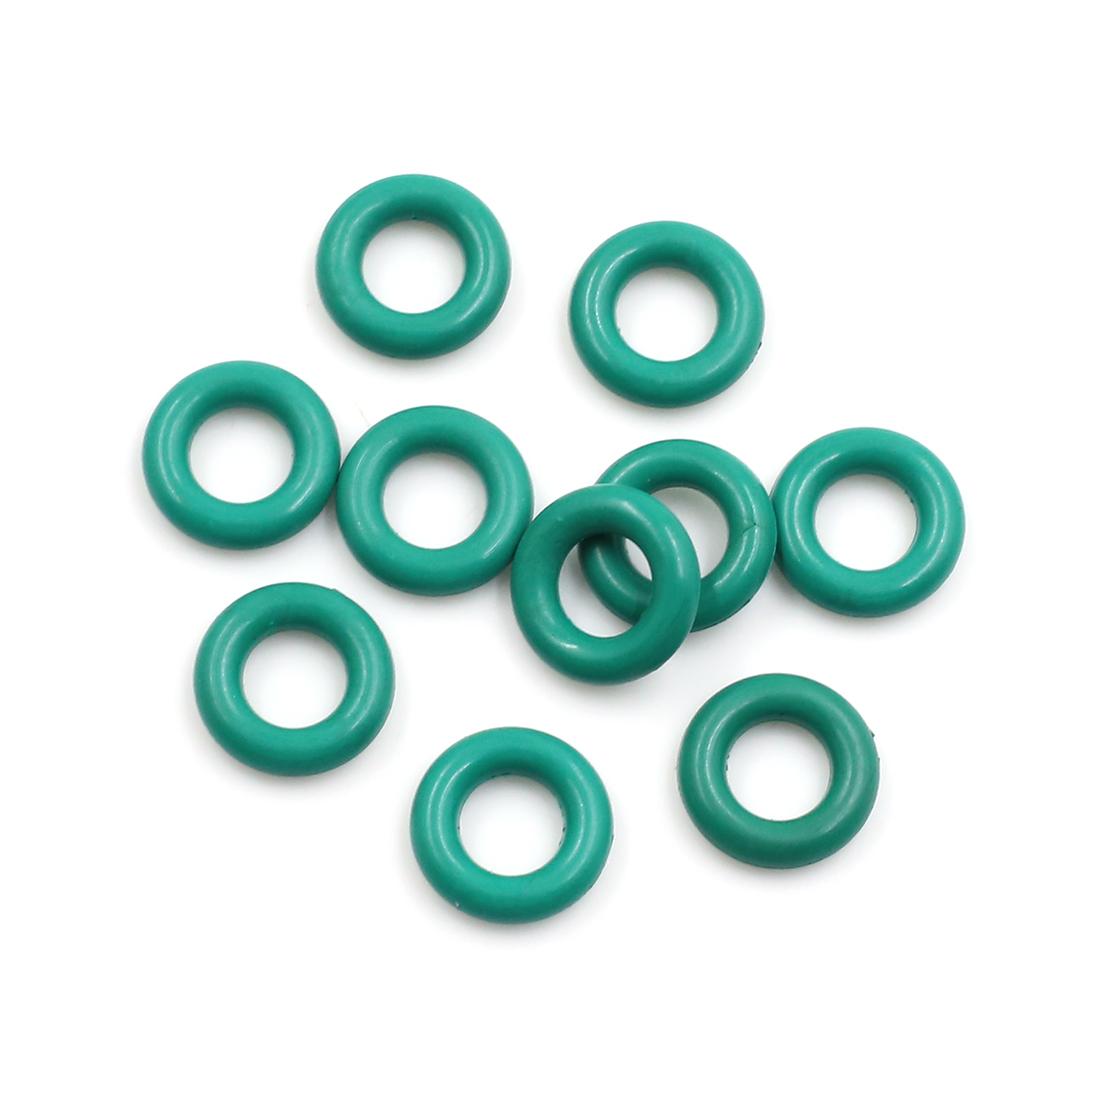 10pcs Green Universal FKM O-Ring Sealing Gasket Washer for Car 14mm x 3.5mm